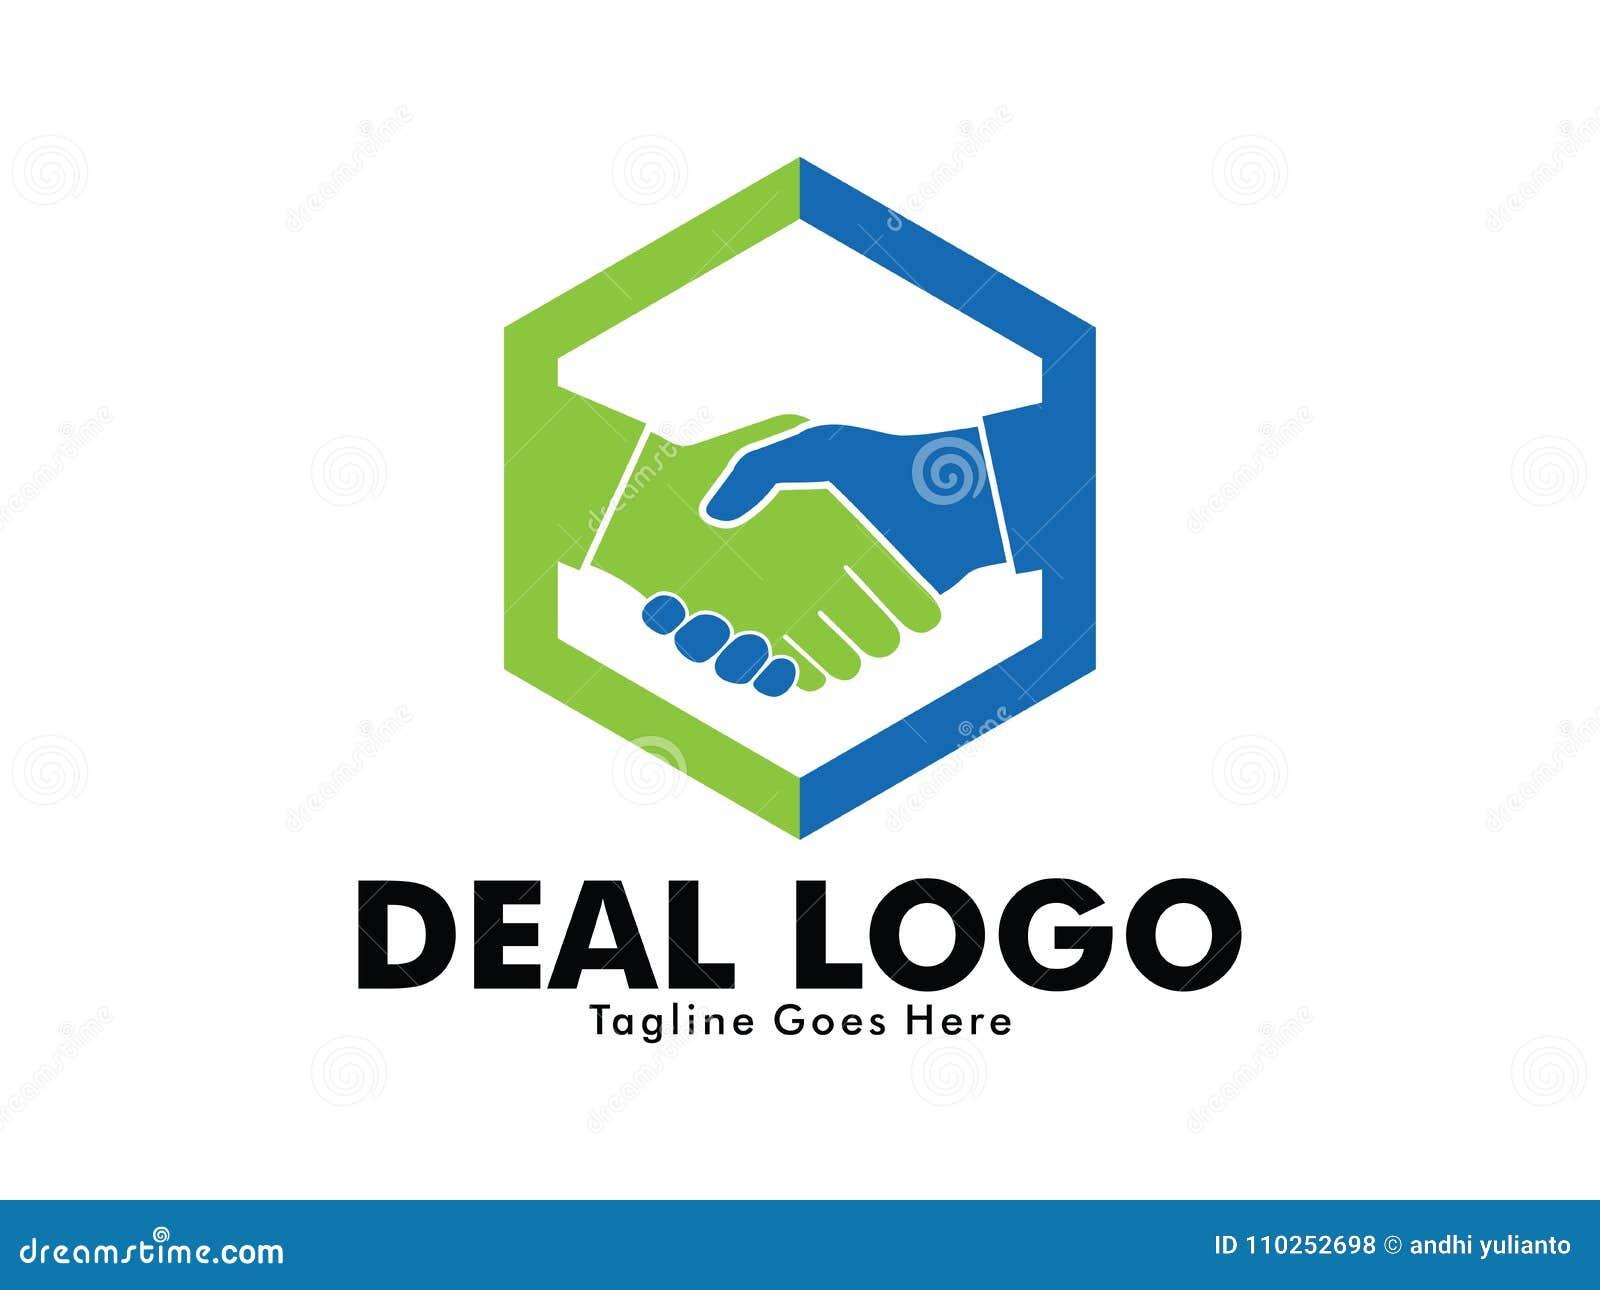 Vector Logo Design Of Deal Handshake Sign Meaning Of Friendship